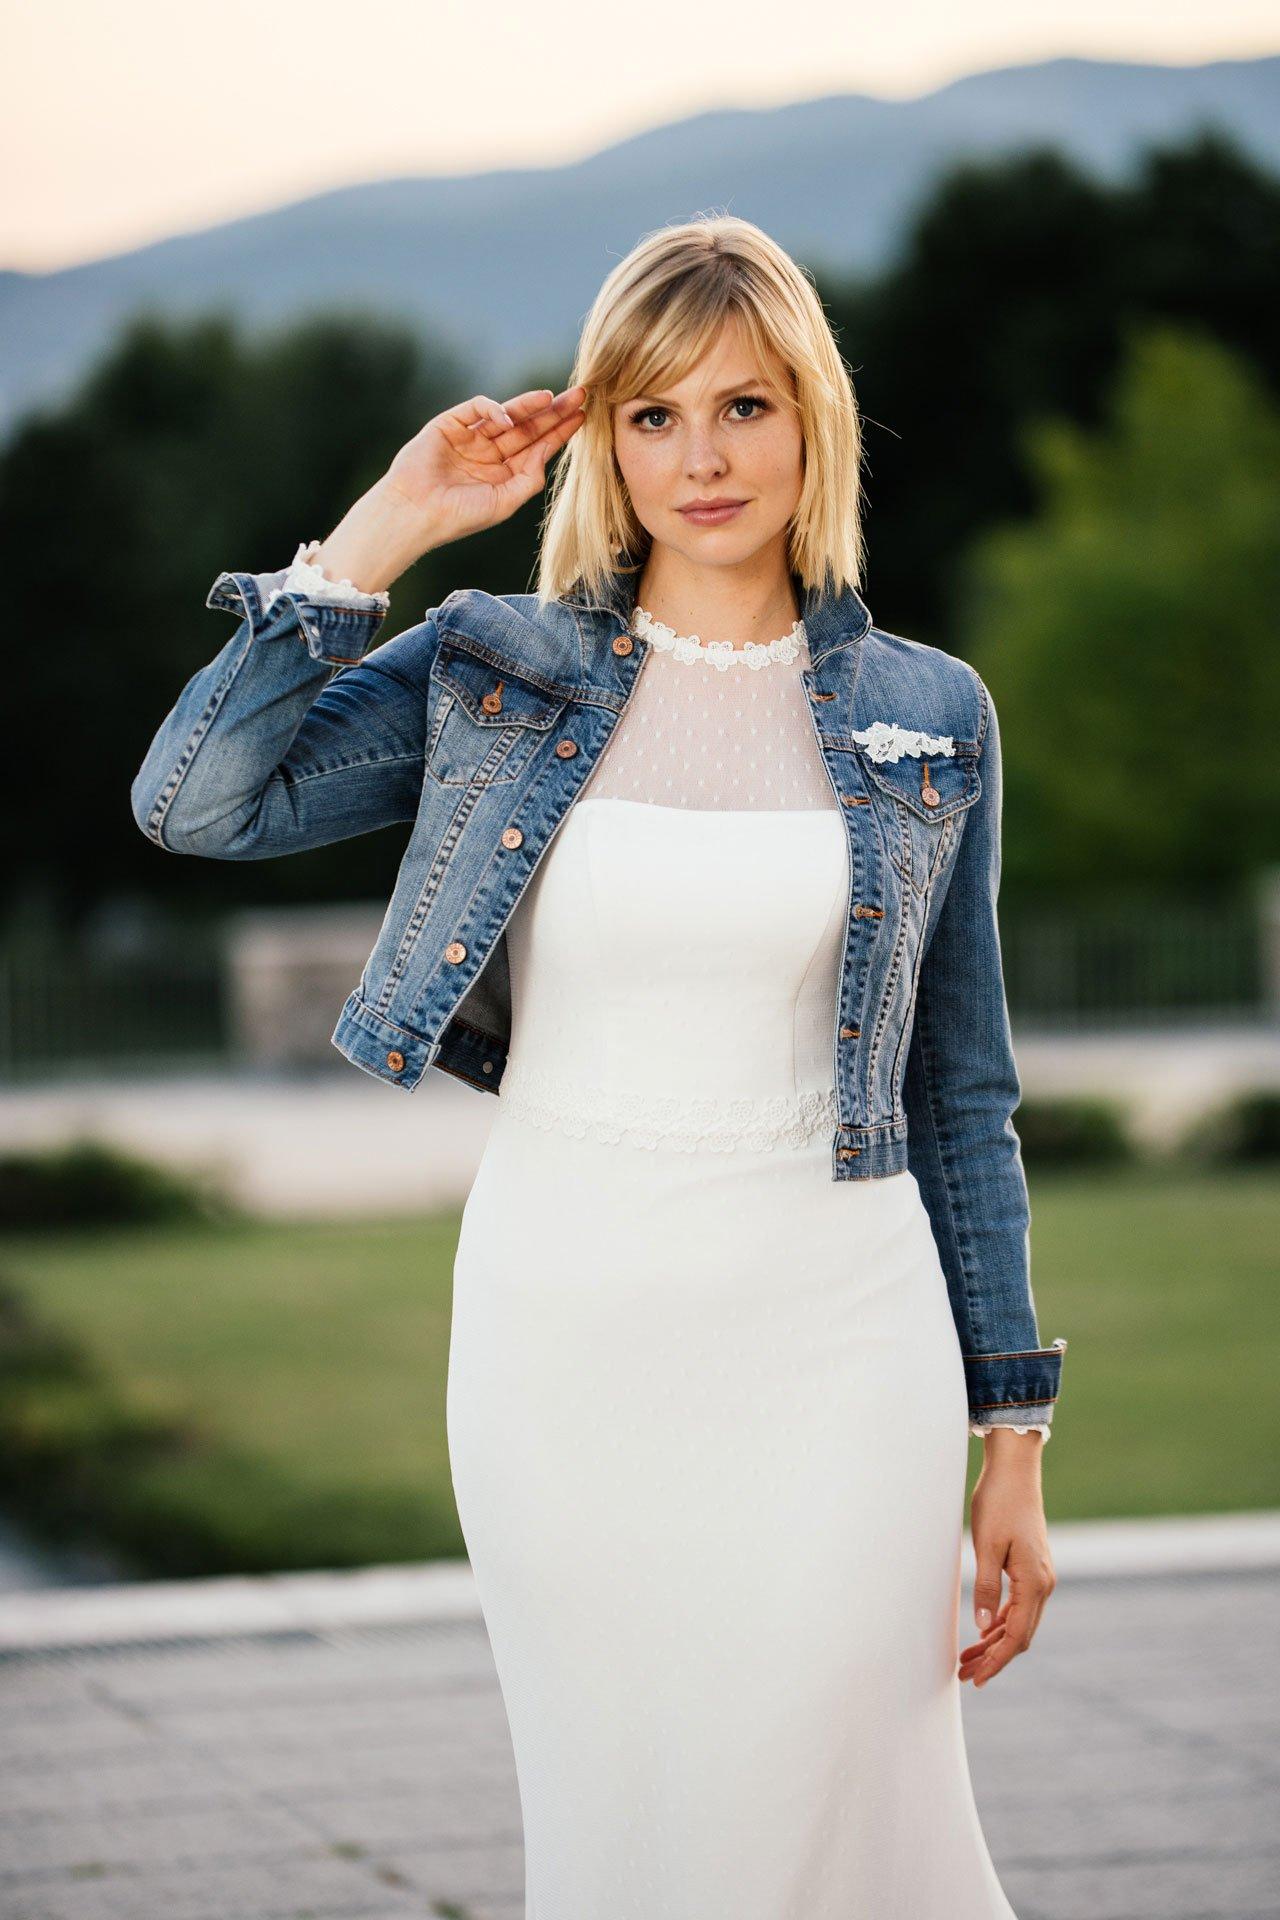 Brautkleid kombiniert mit toller Jeansjacke